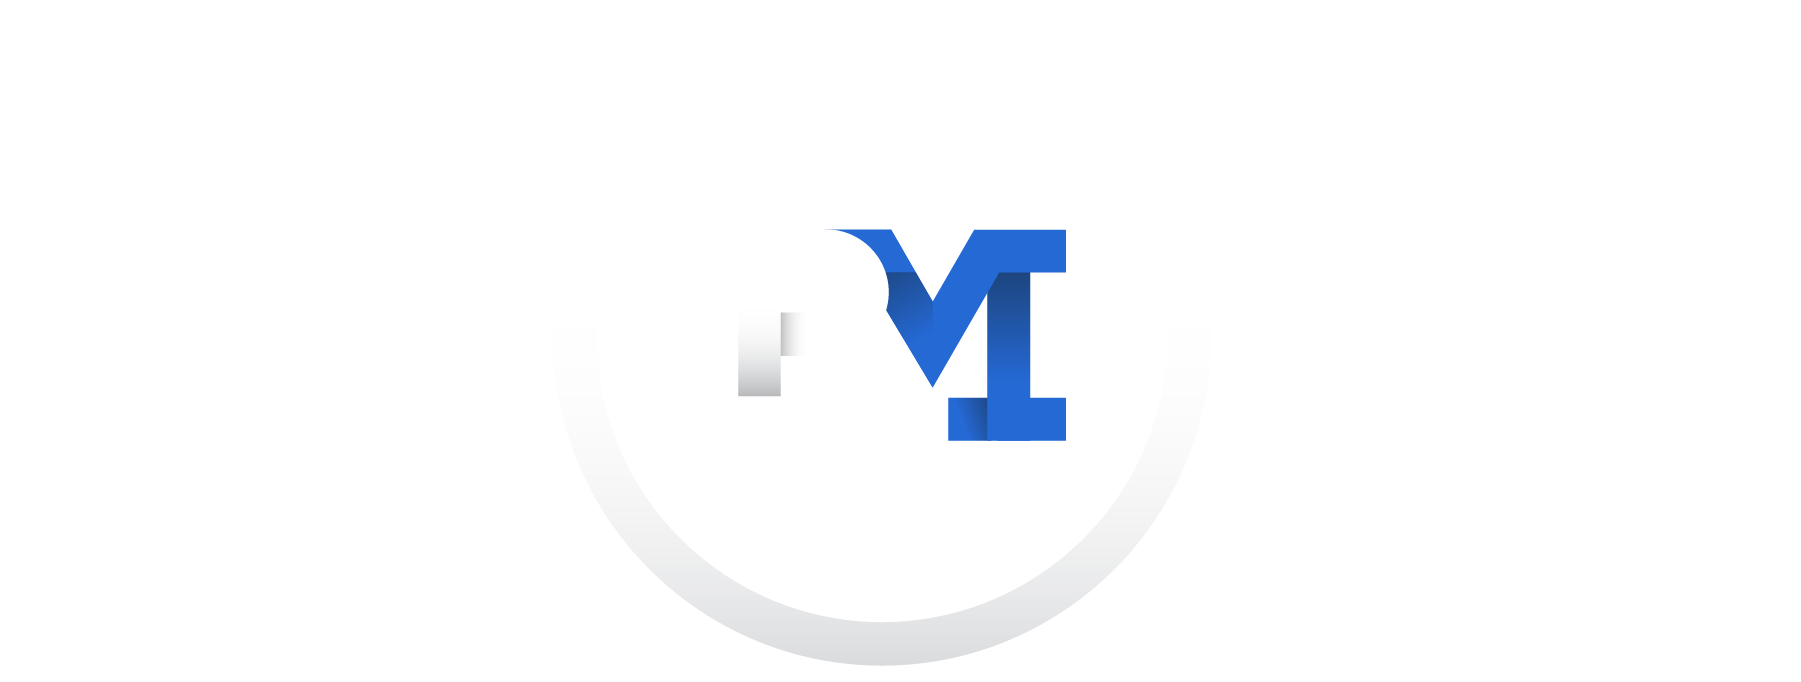 BM90_logo_Color_Icon-IM_REV copy 4.png